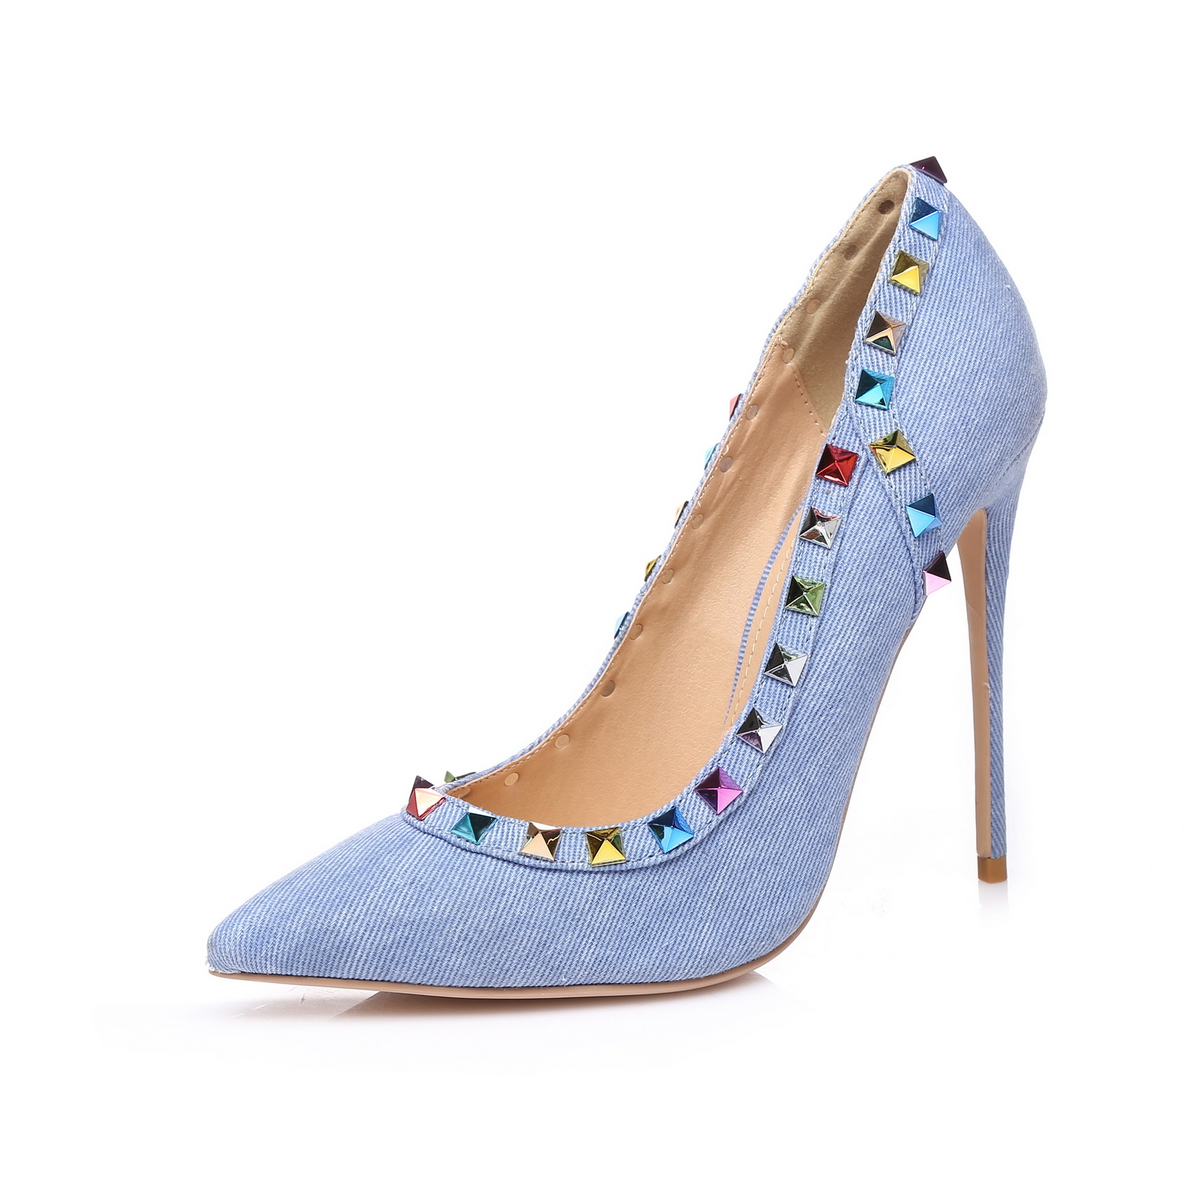 GIARO - Damen High Heels - Blau Schuhe in Übergrößen – Bild 1